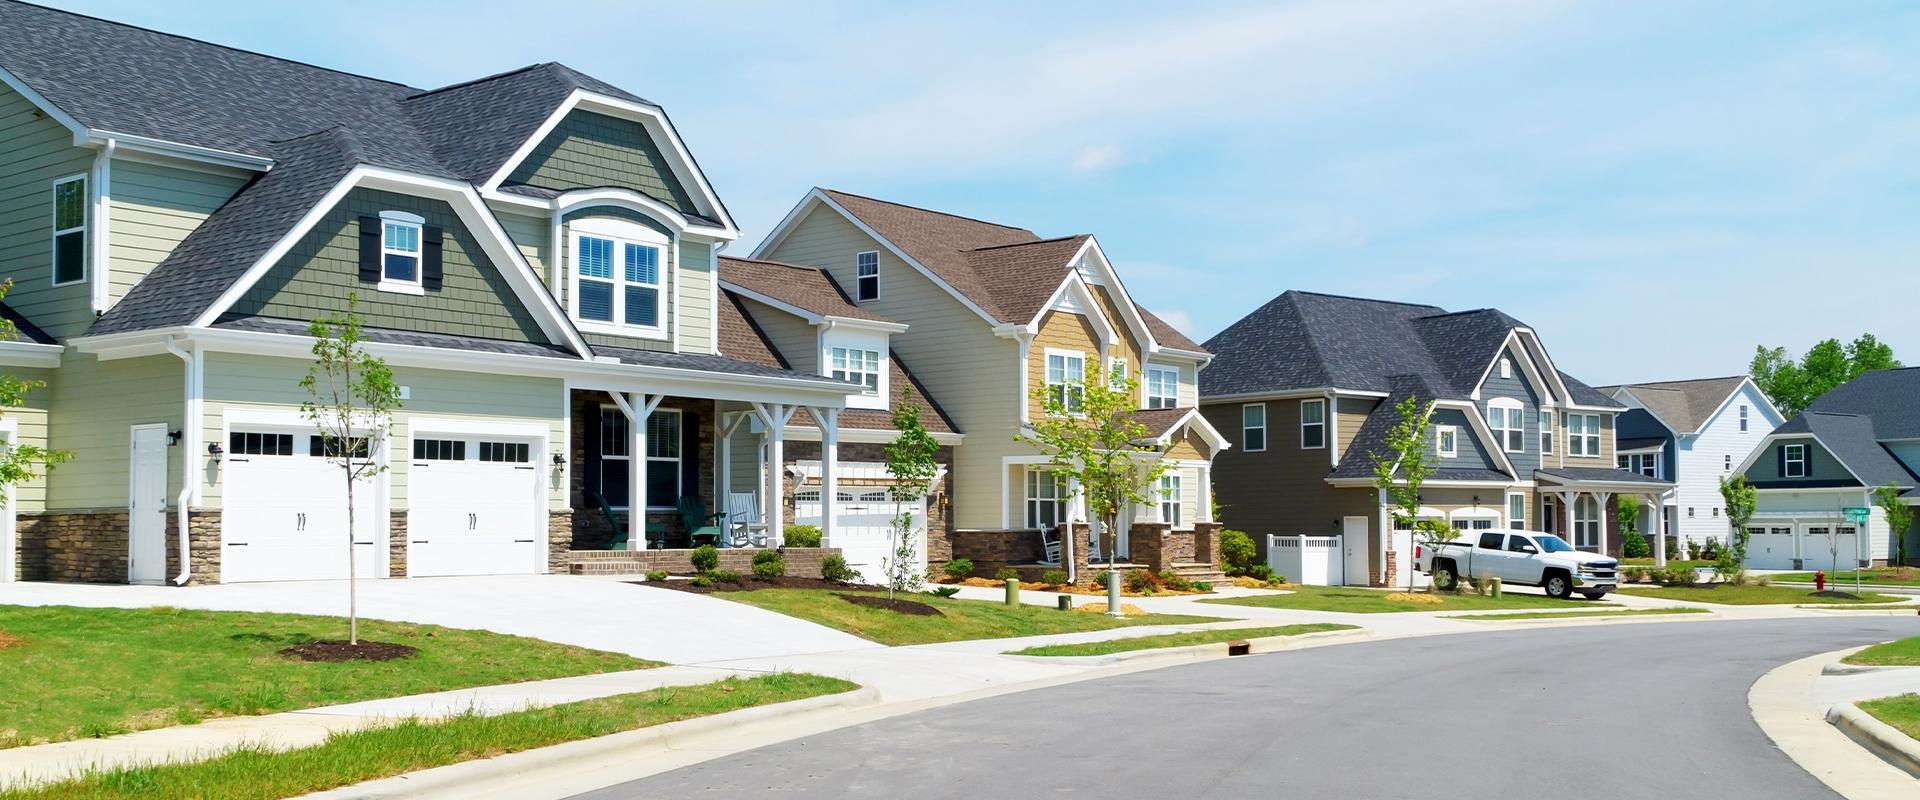 street view of suburban neighborhood